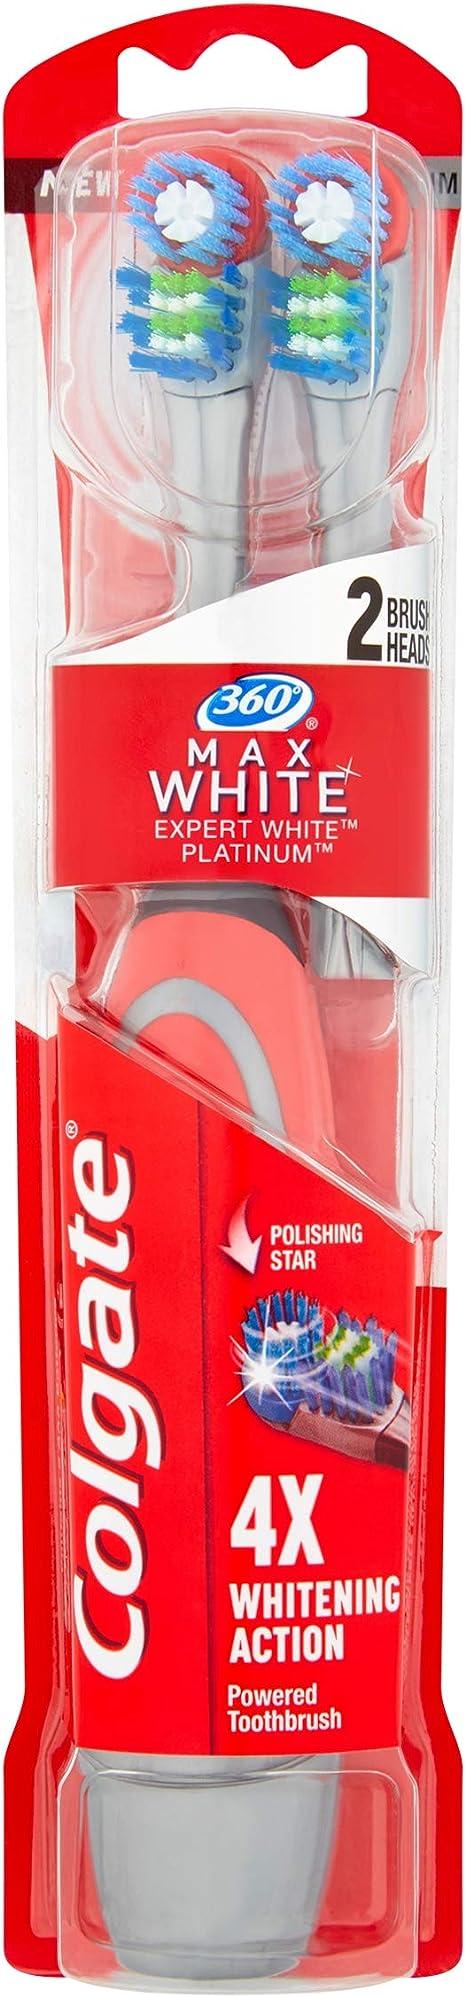 Colgate 360° Max White Expert Whitening Battery Powered Toothbrush Heads, Pack of 2